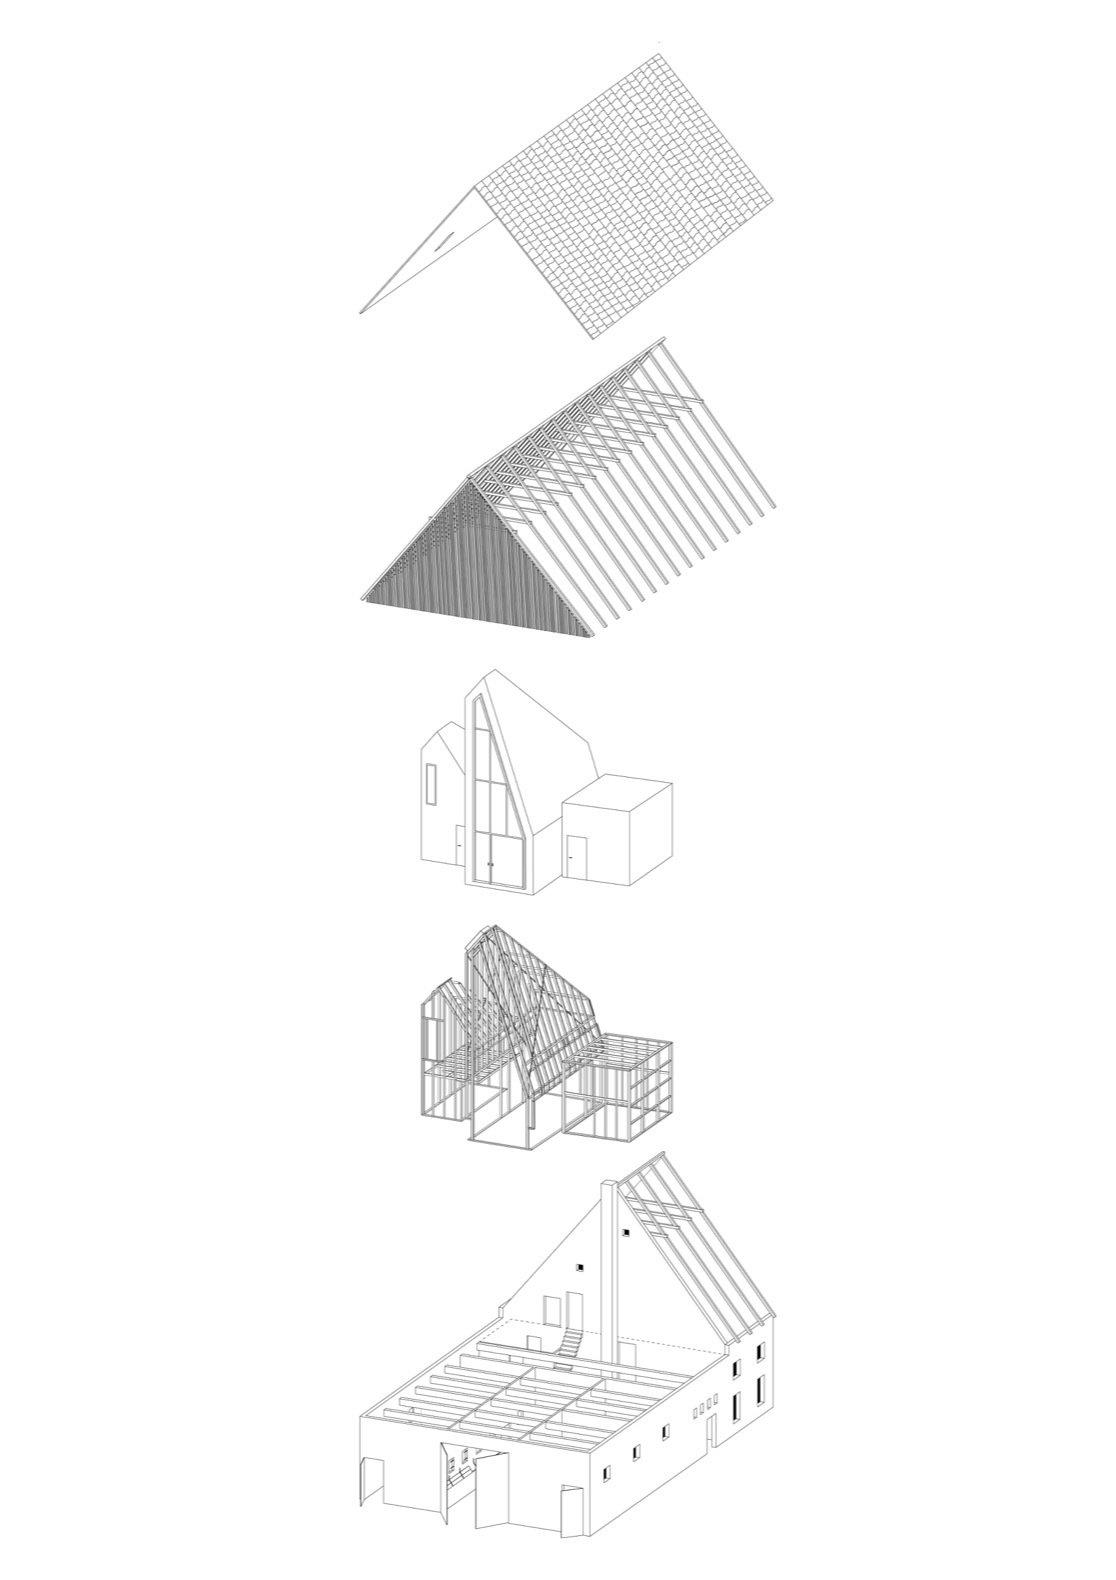 Dortmannhof exploded axon diagram